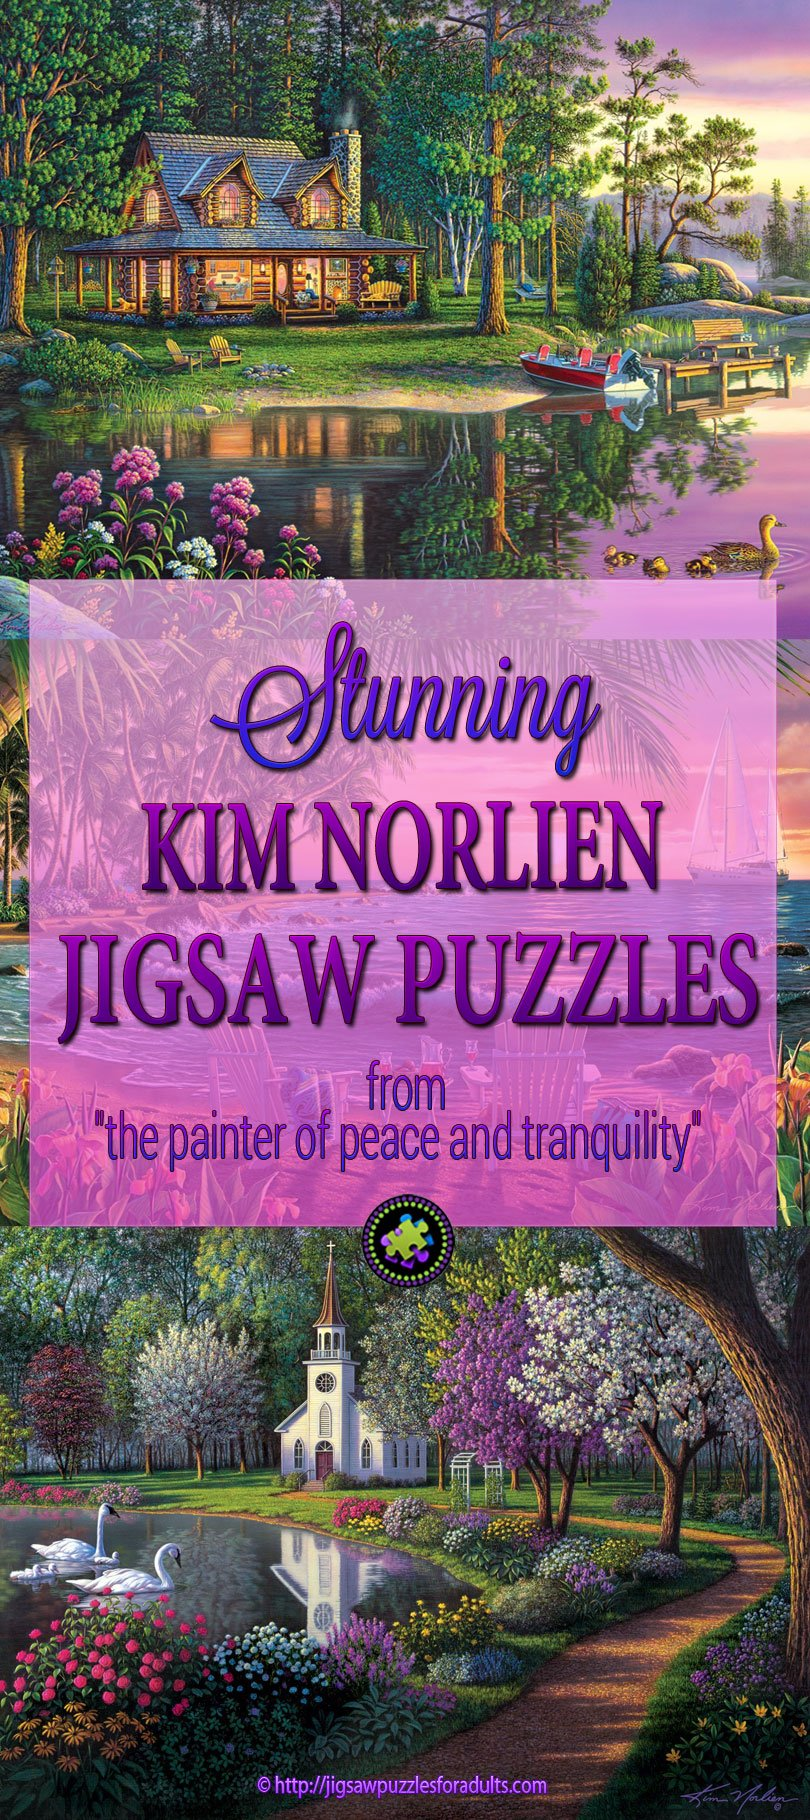 Kim Norlien jigsaw puzzles